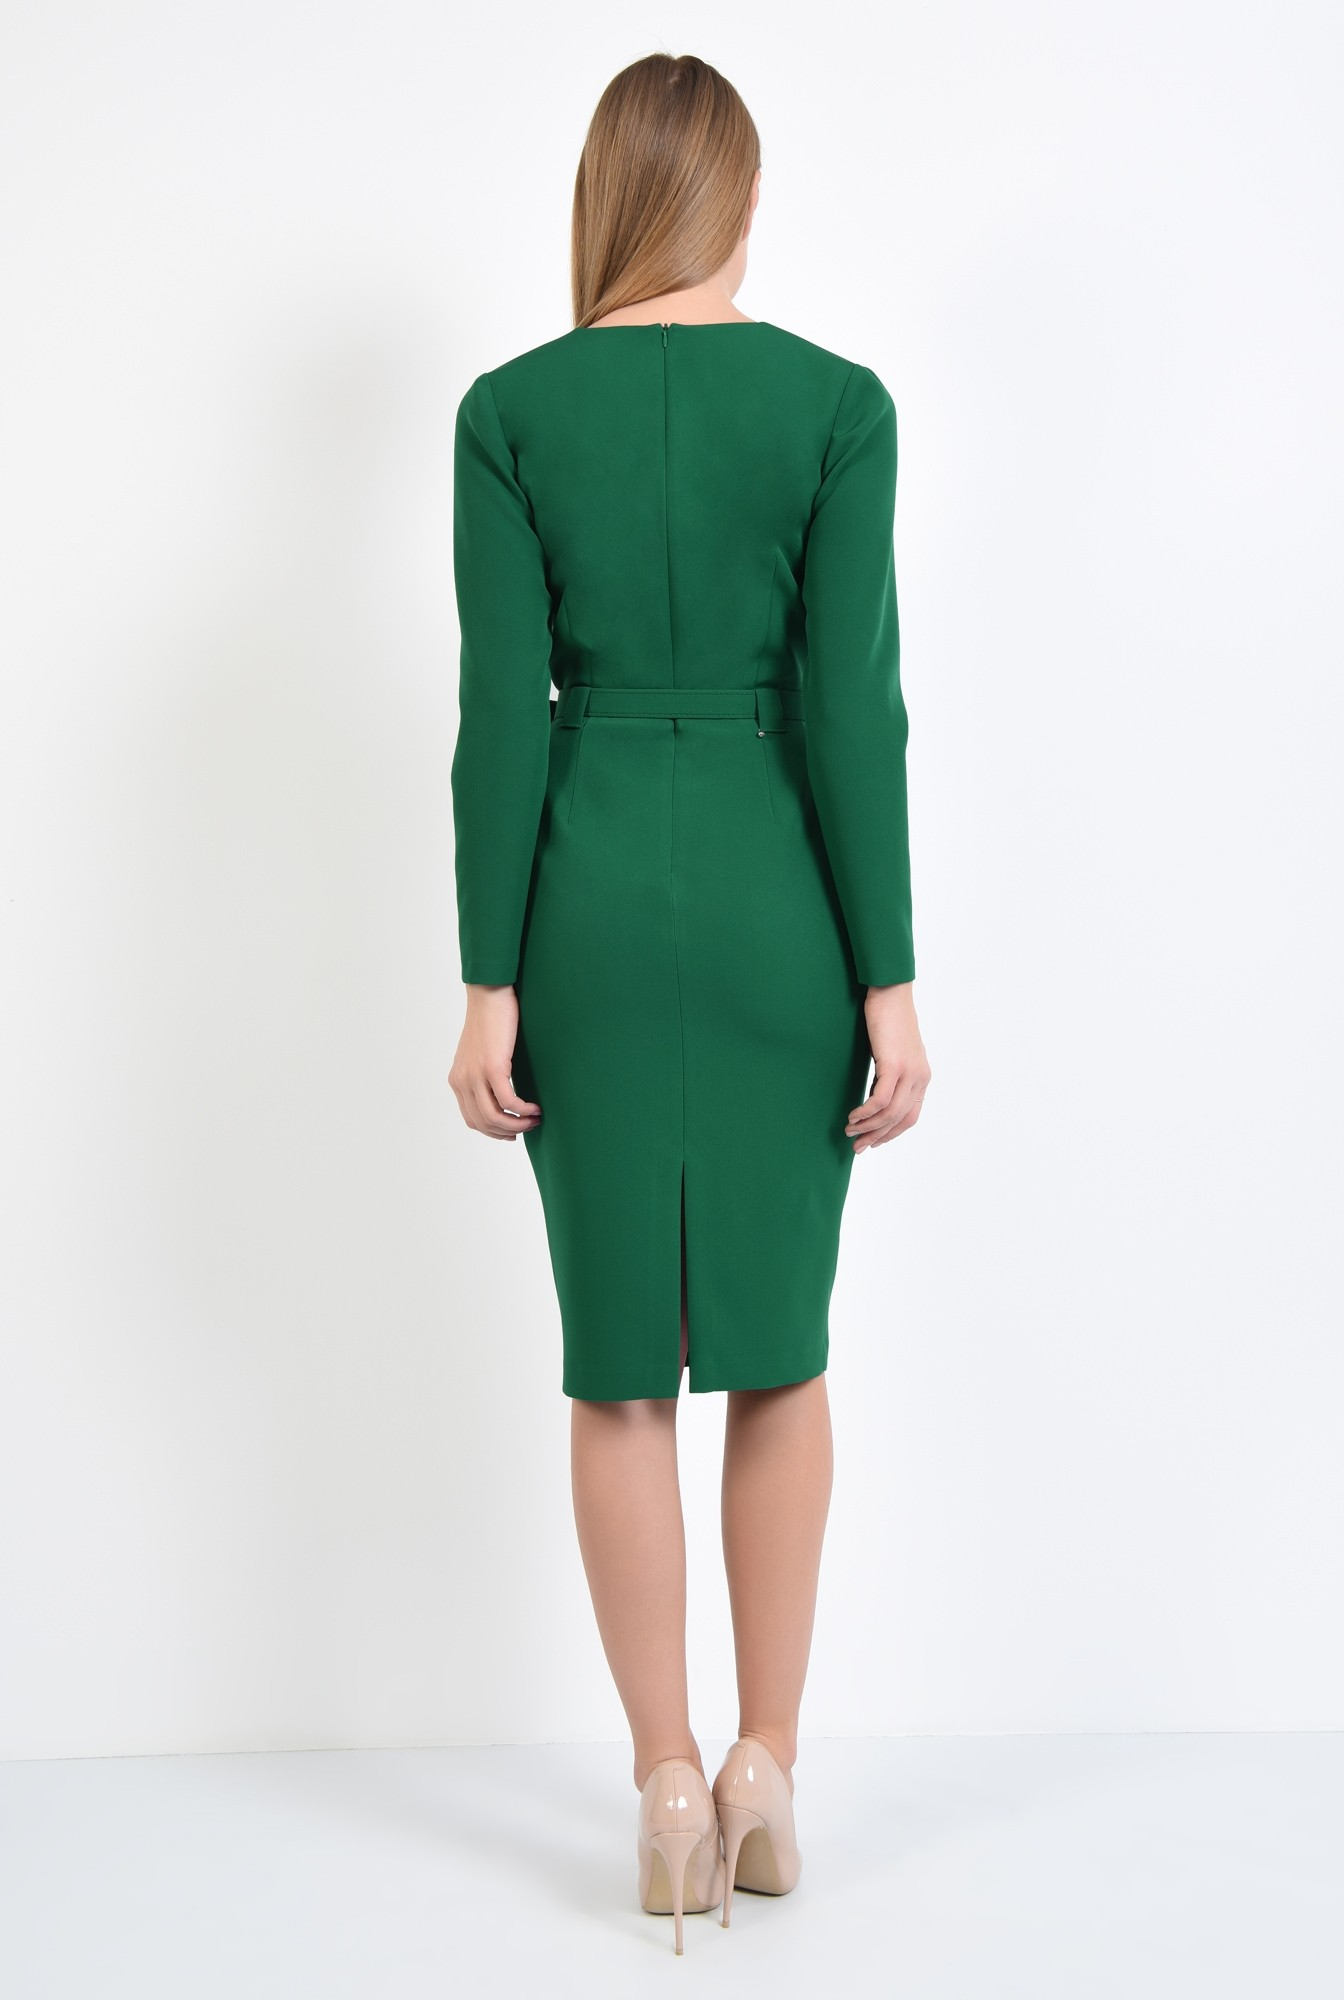 1 - rochie casual, midi, maneci lungi, centura ingusta, verde